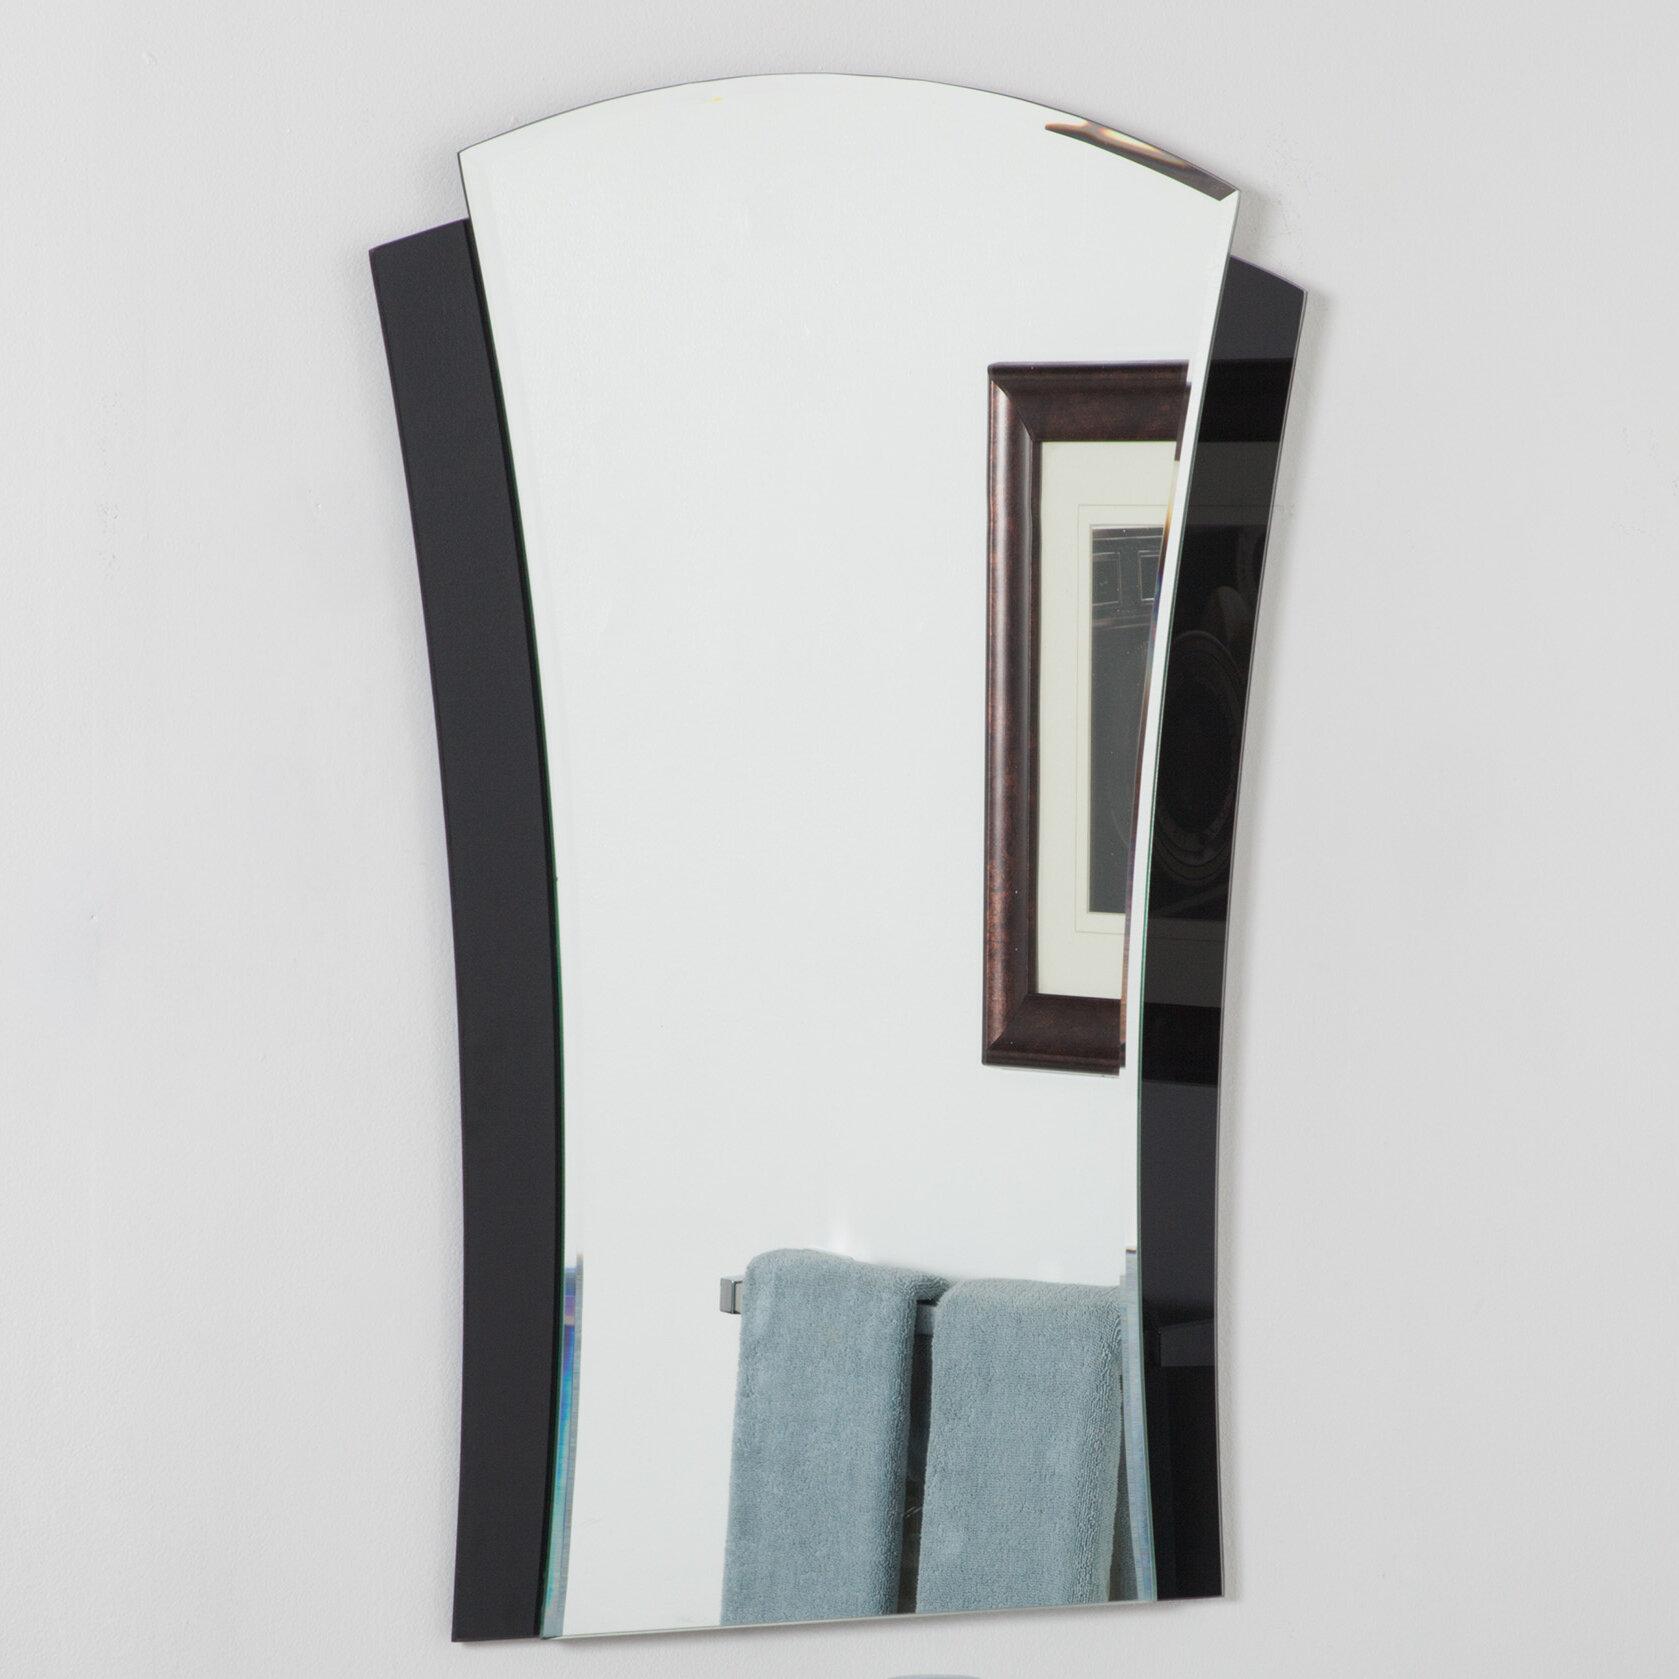 Decor Wonderland Deco Wall Mirror Reviews Wayfair